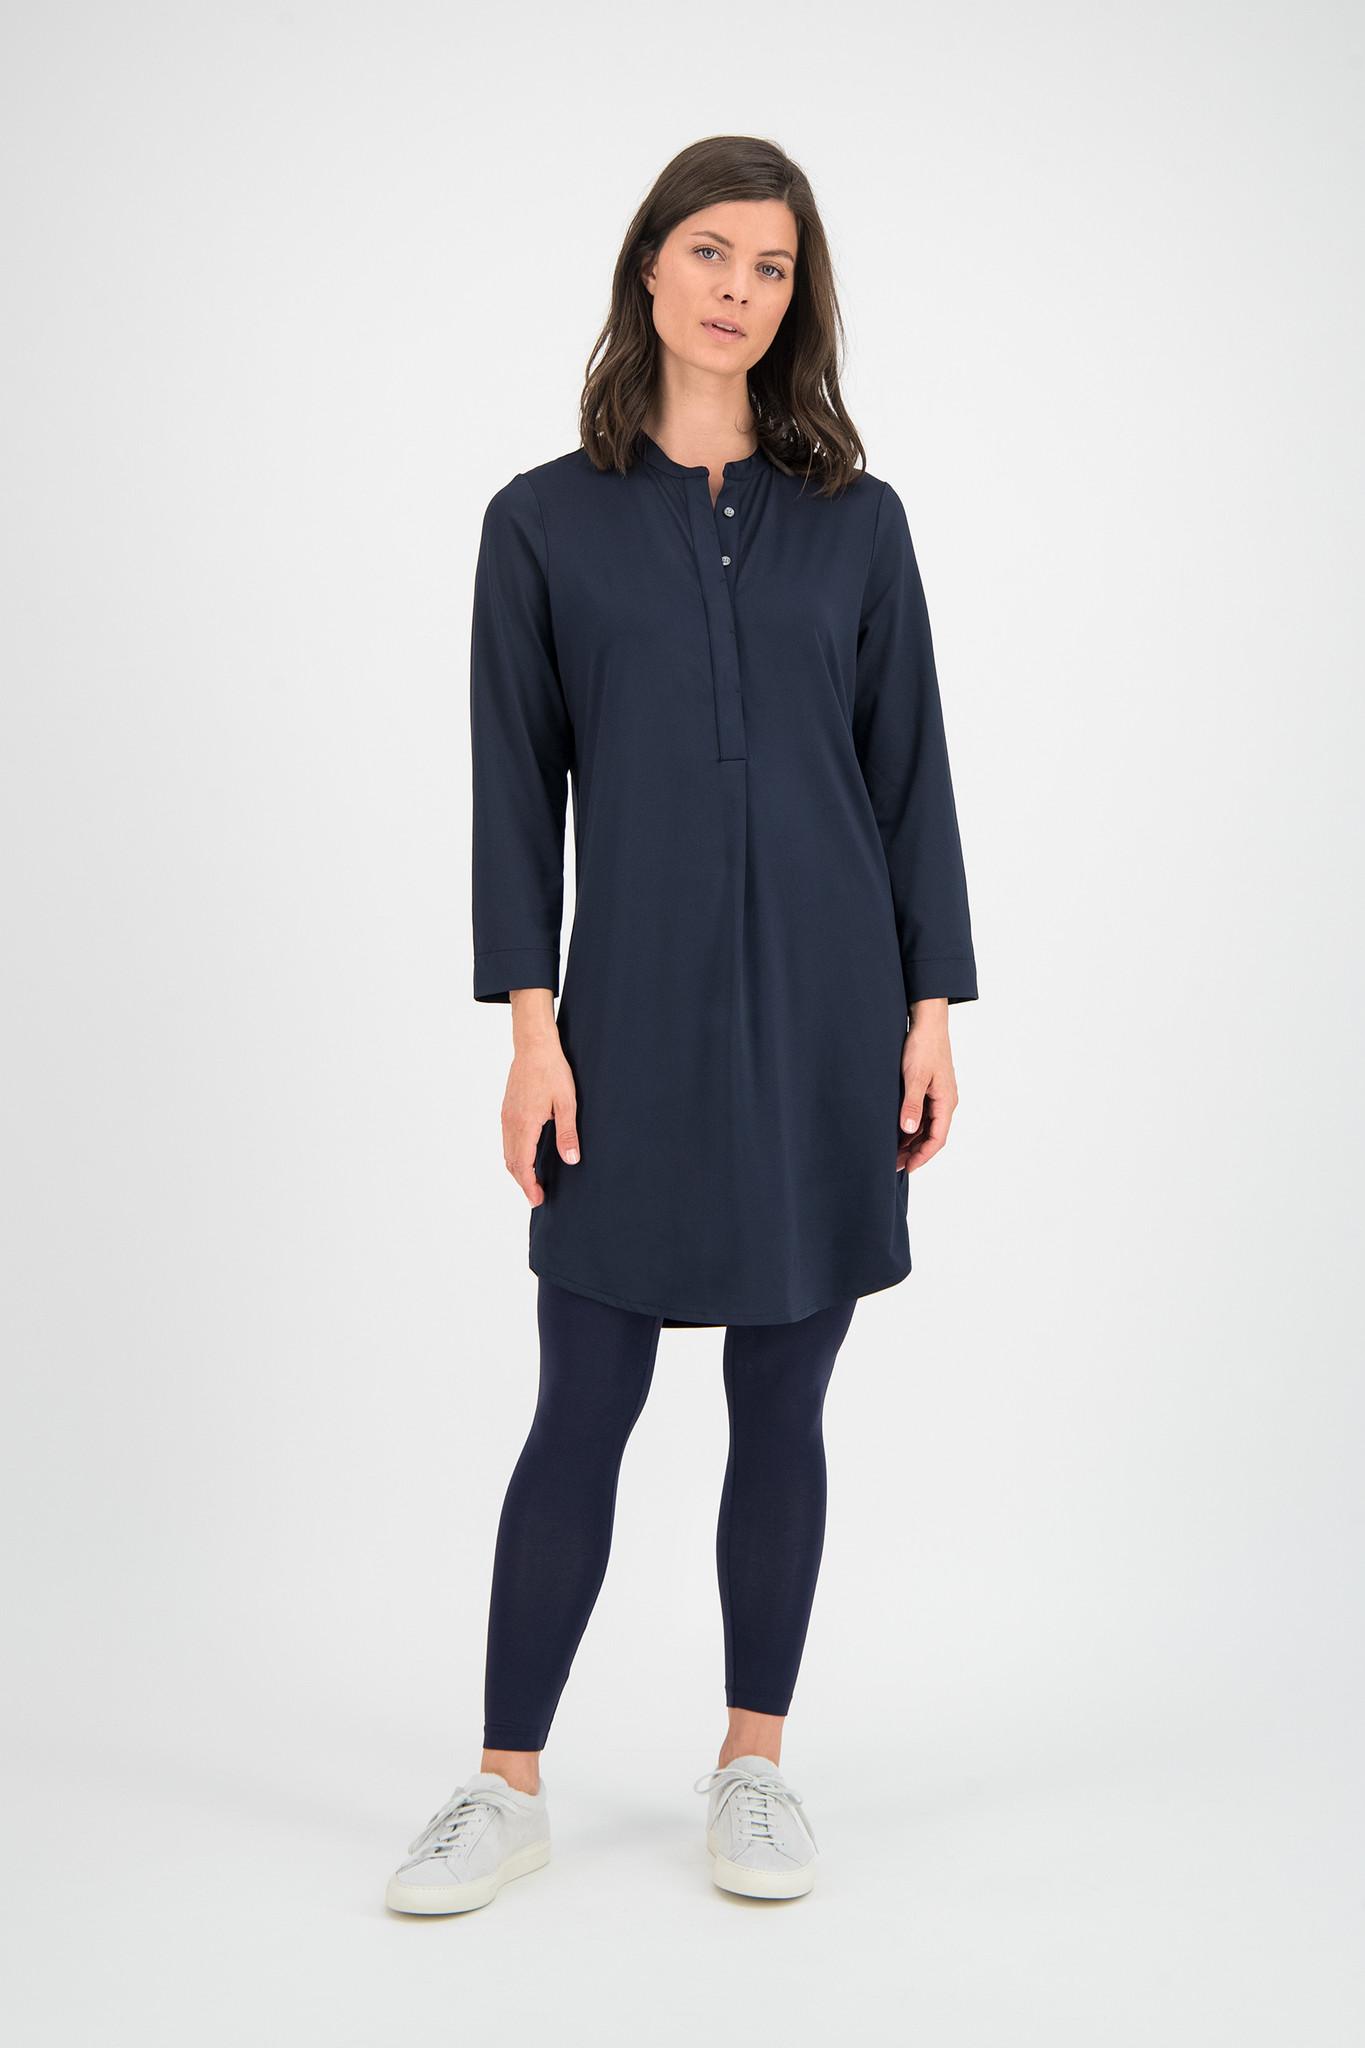 SYLVER Silky Jersey Dress - Dark Blue